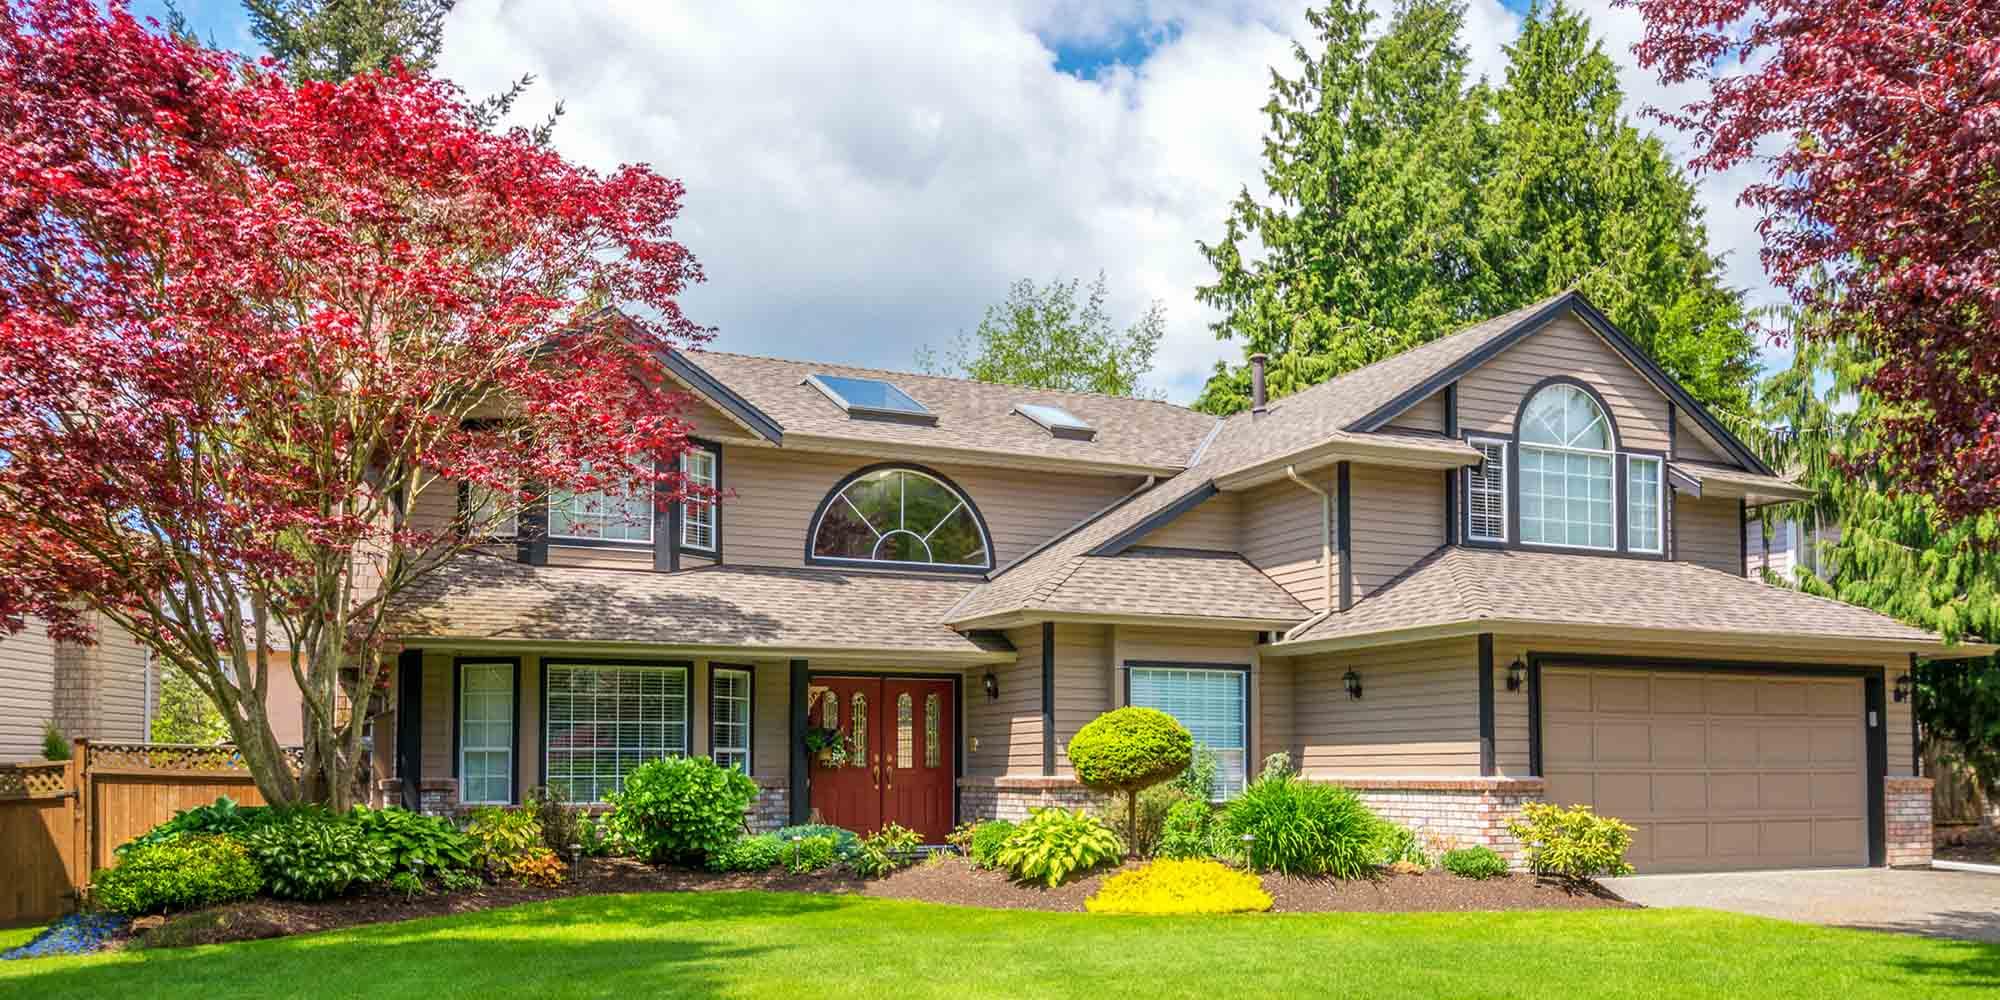 Allendale Dream Homes Bergen County Nj Real Estate